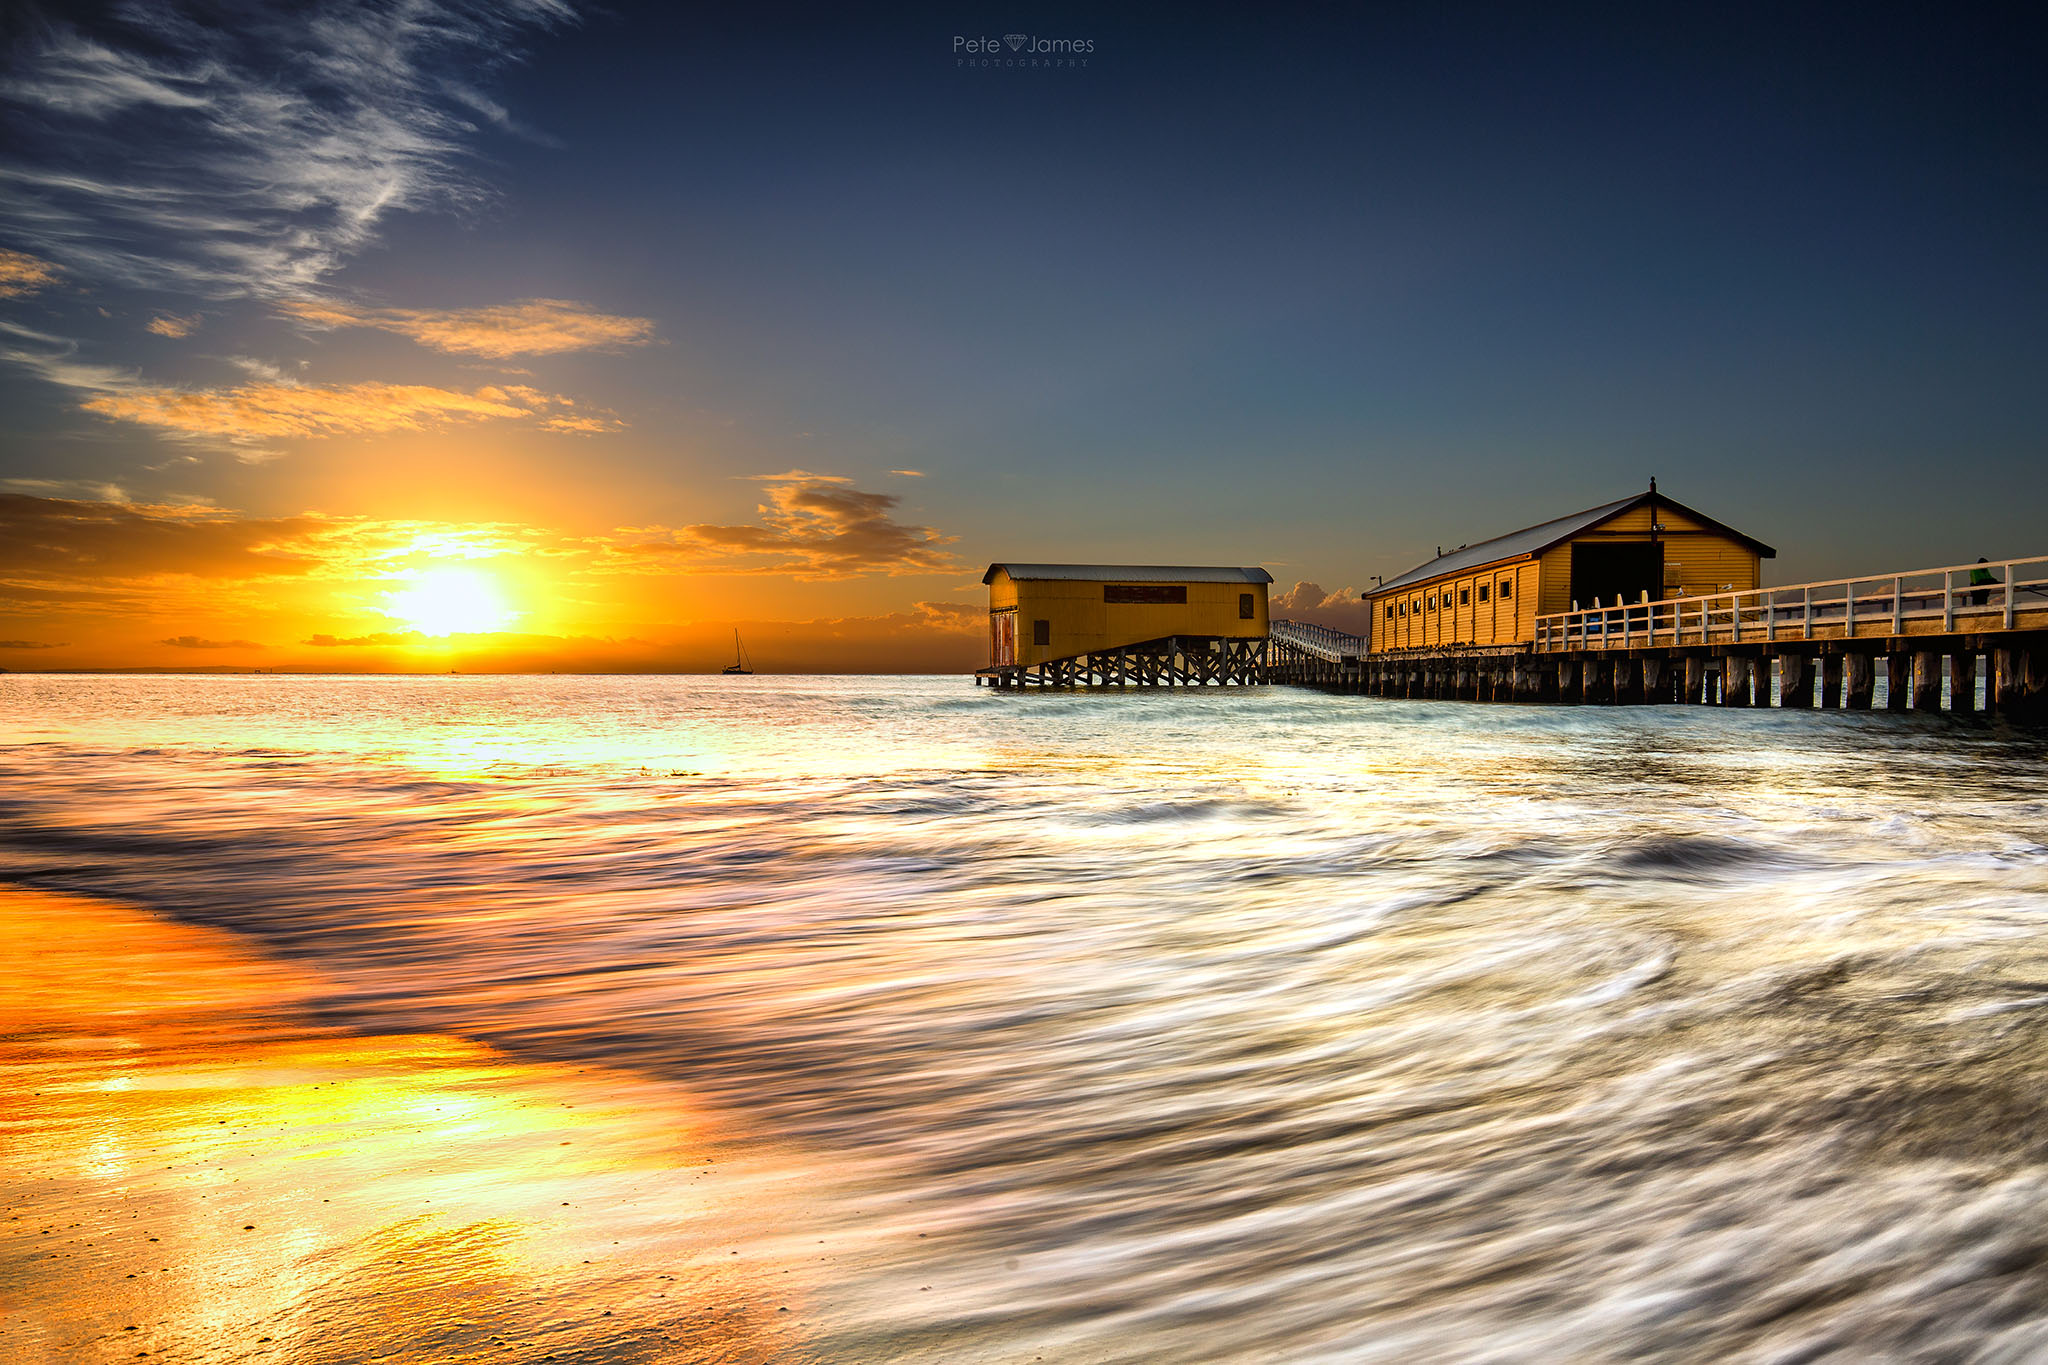 boathouse-Edit-Edit.jpg